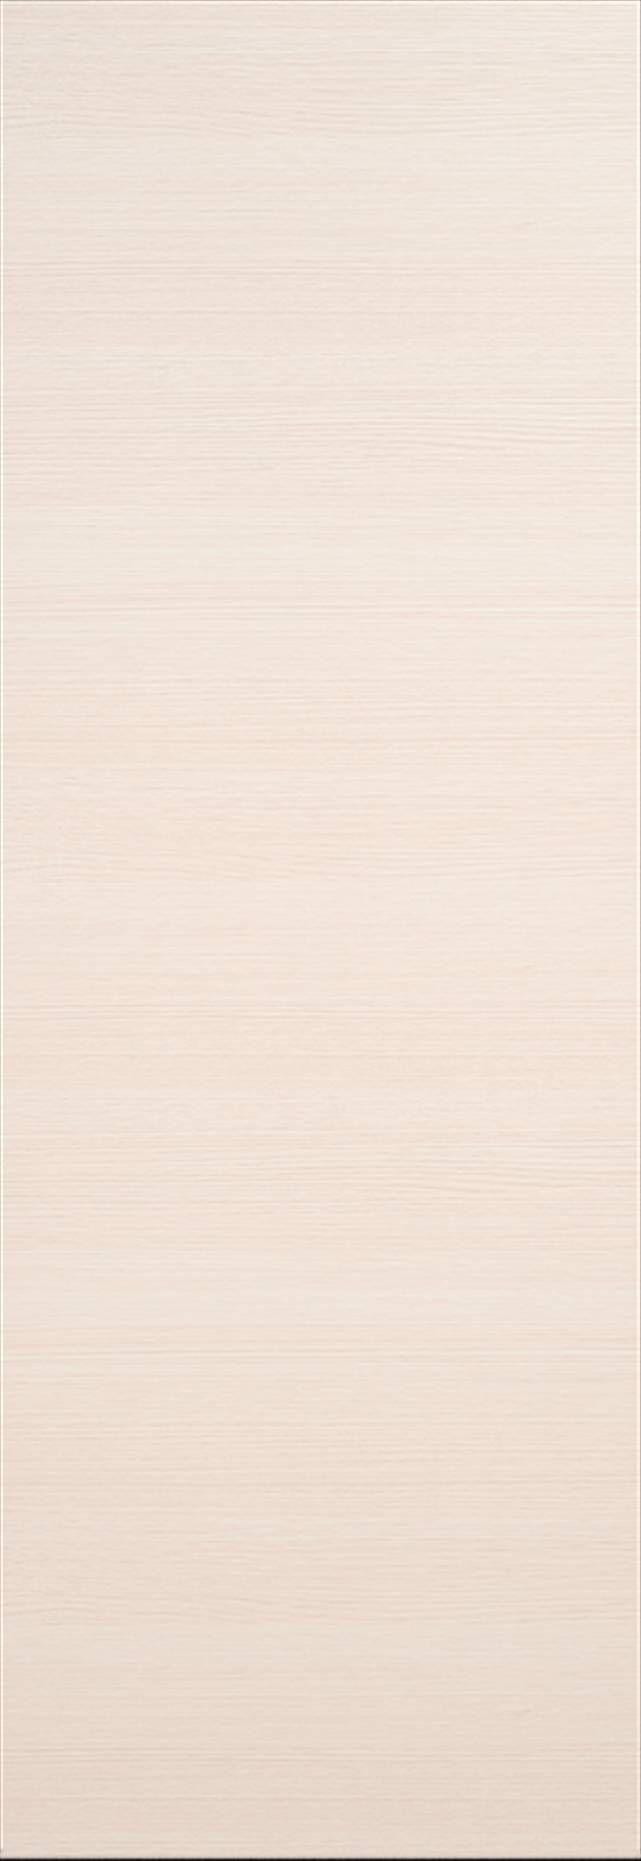 Tivoli А-2 Invisible цвет - Беленый дуб Без стекла (ДГ)